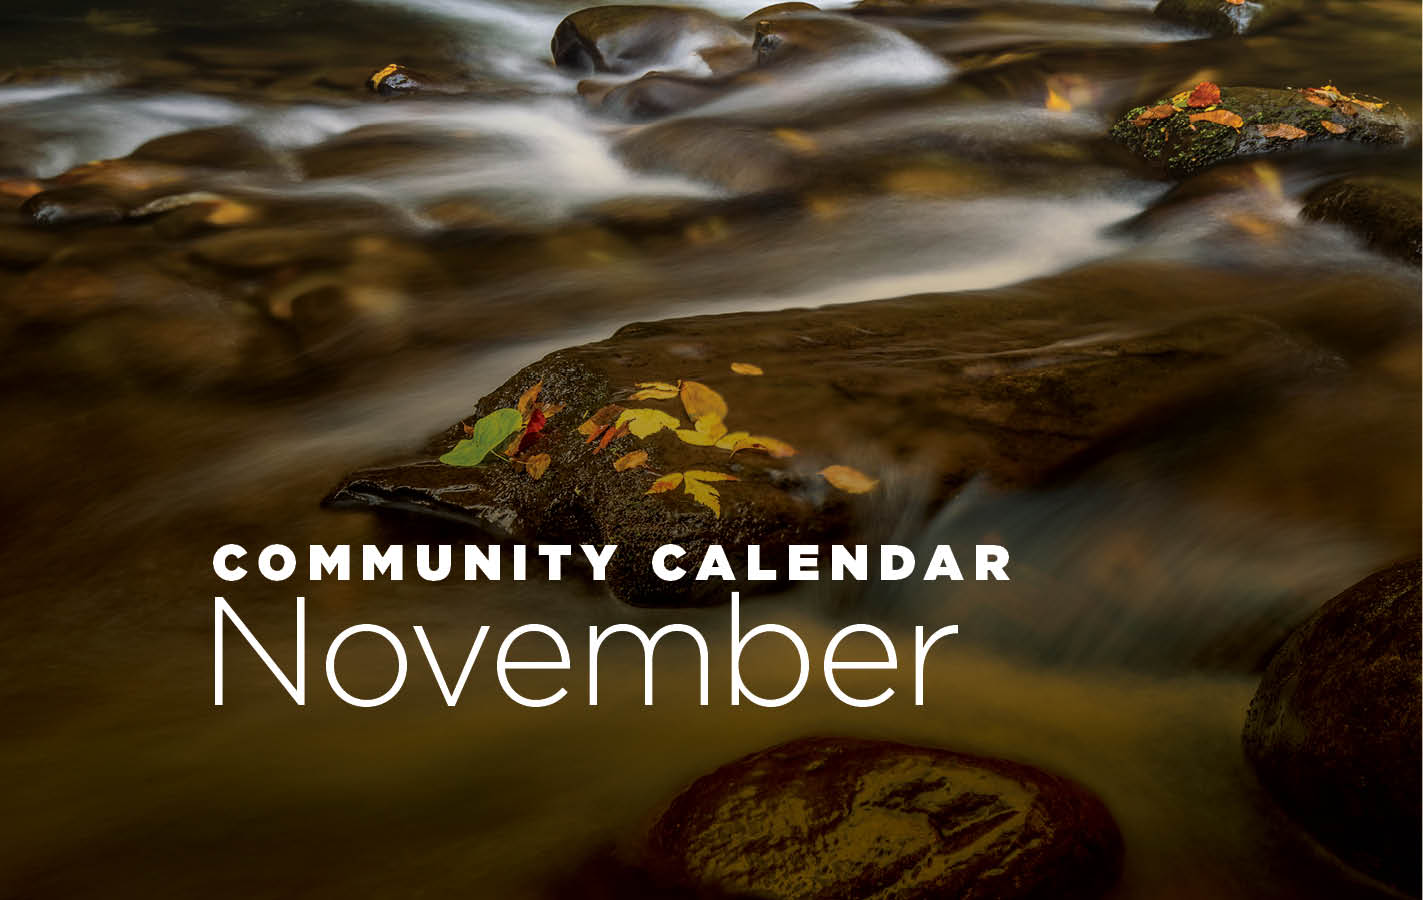 Community Calendar: November 2018